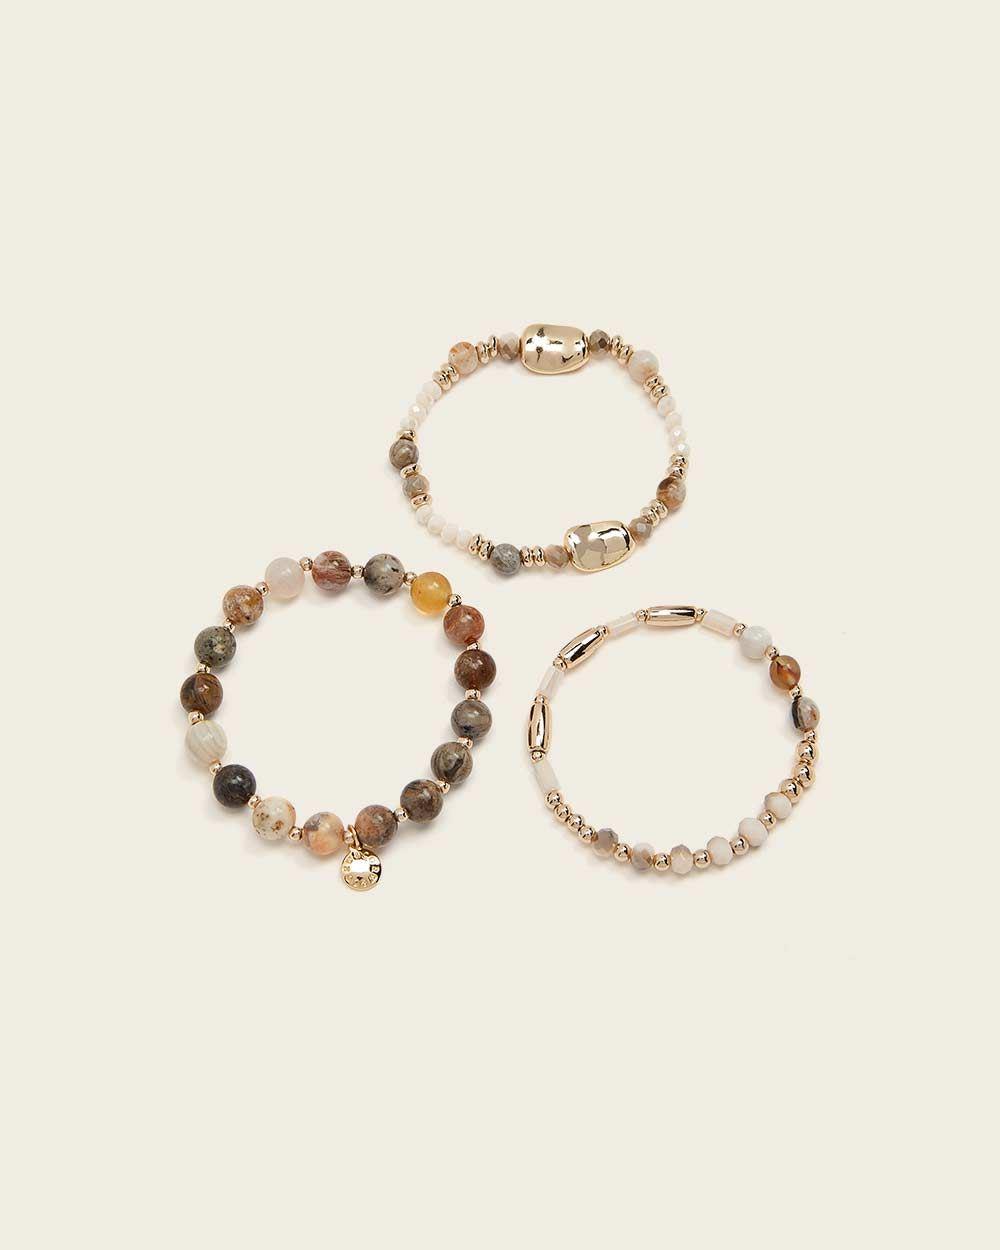 faitmain jewel handmade Bracelet SIR\u00c8NE bracelet stones semiprecious gift jewelry crystals